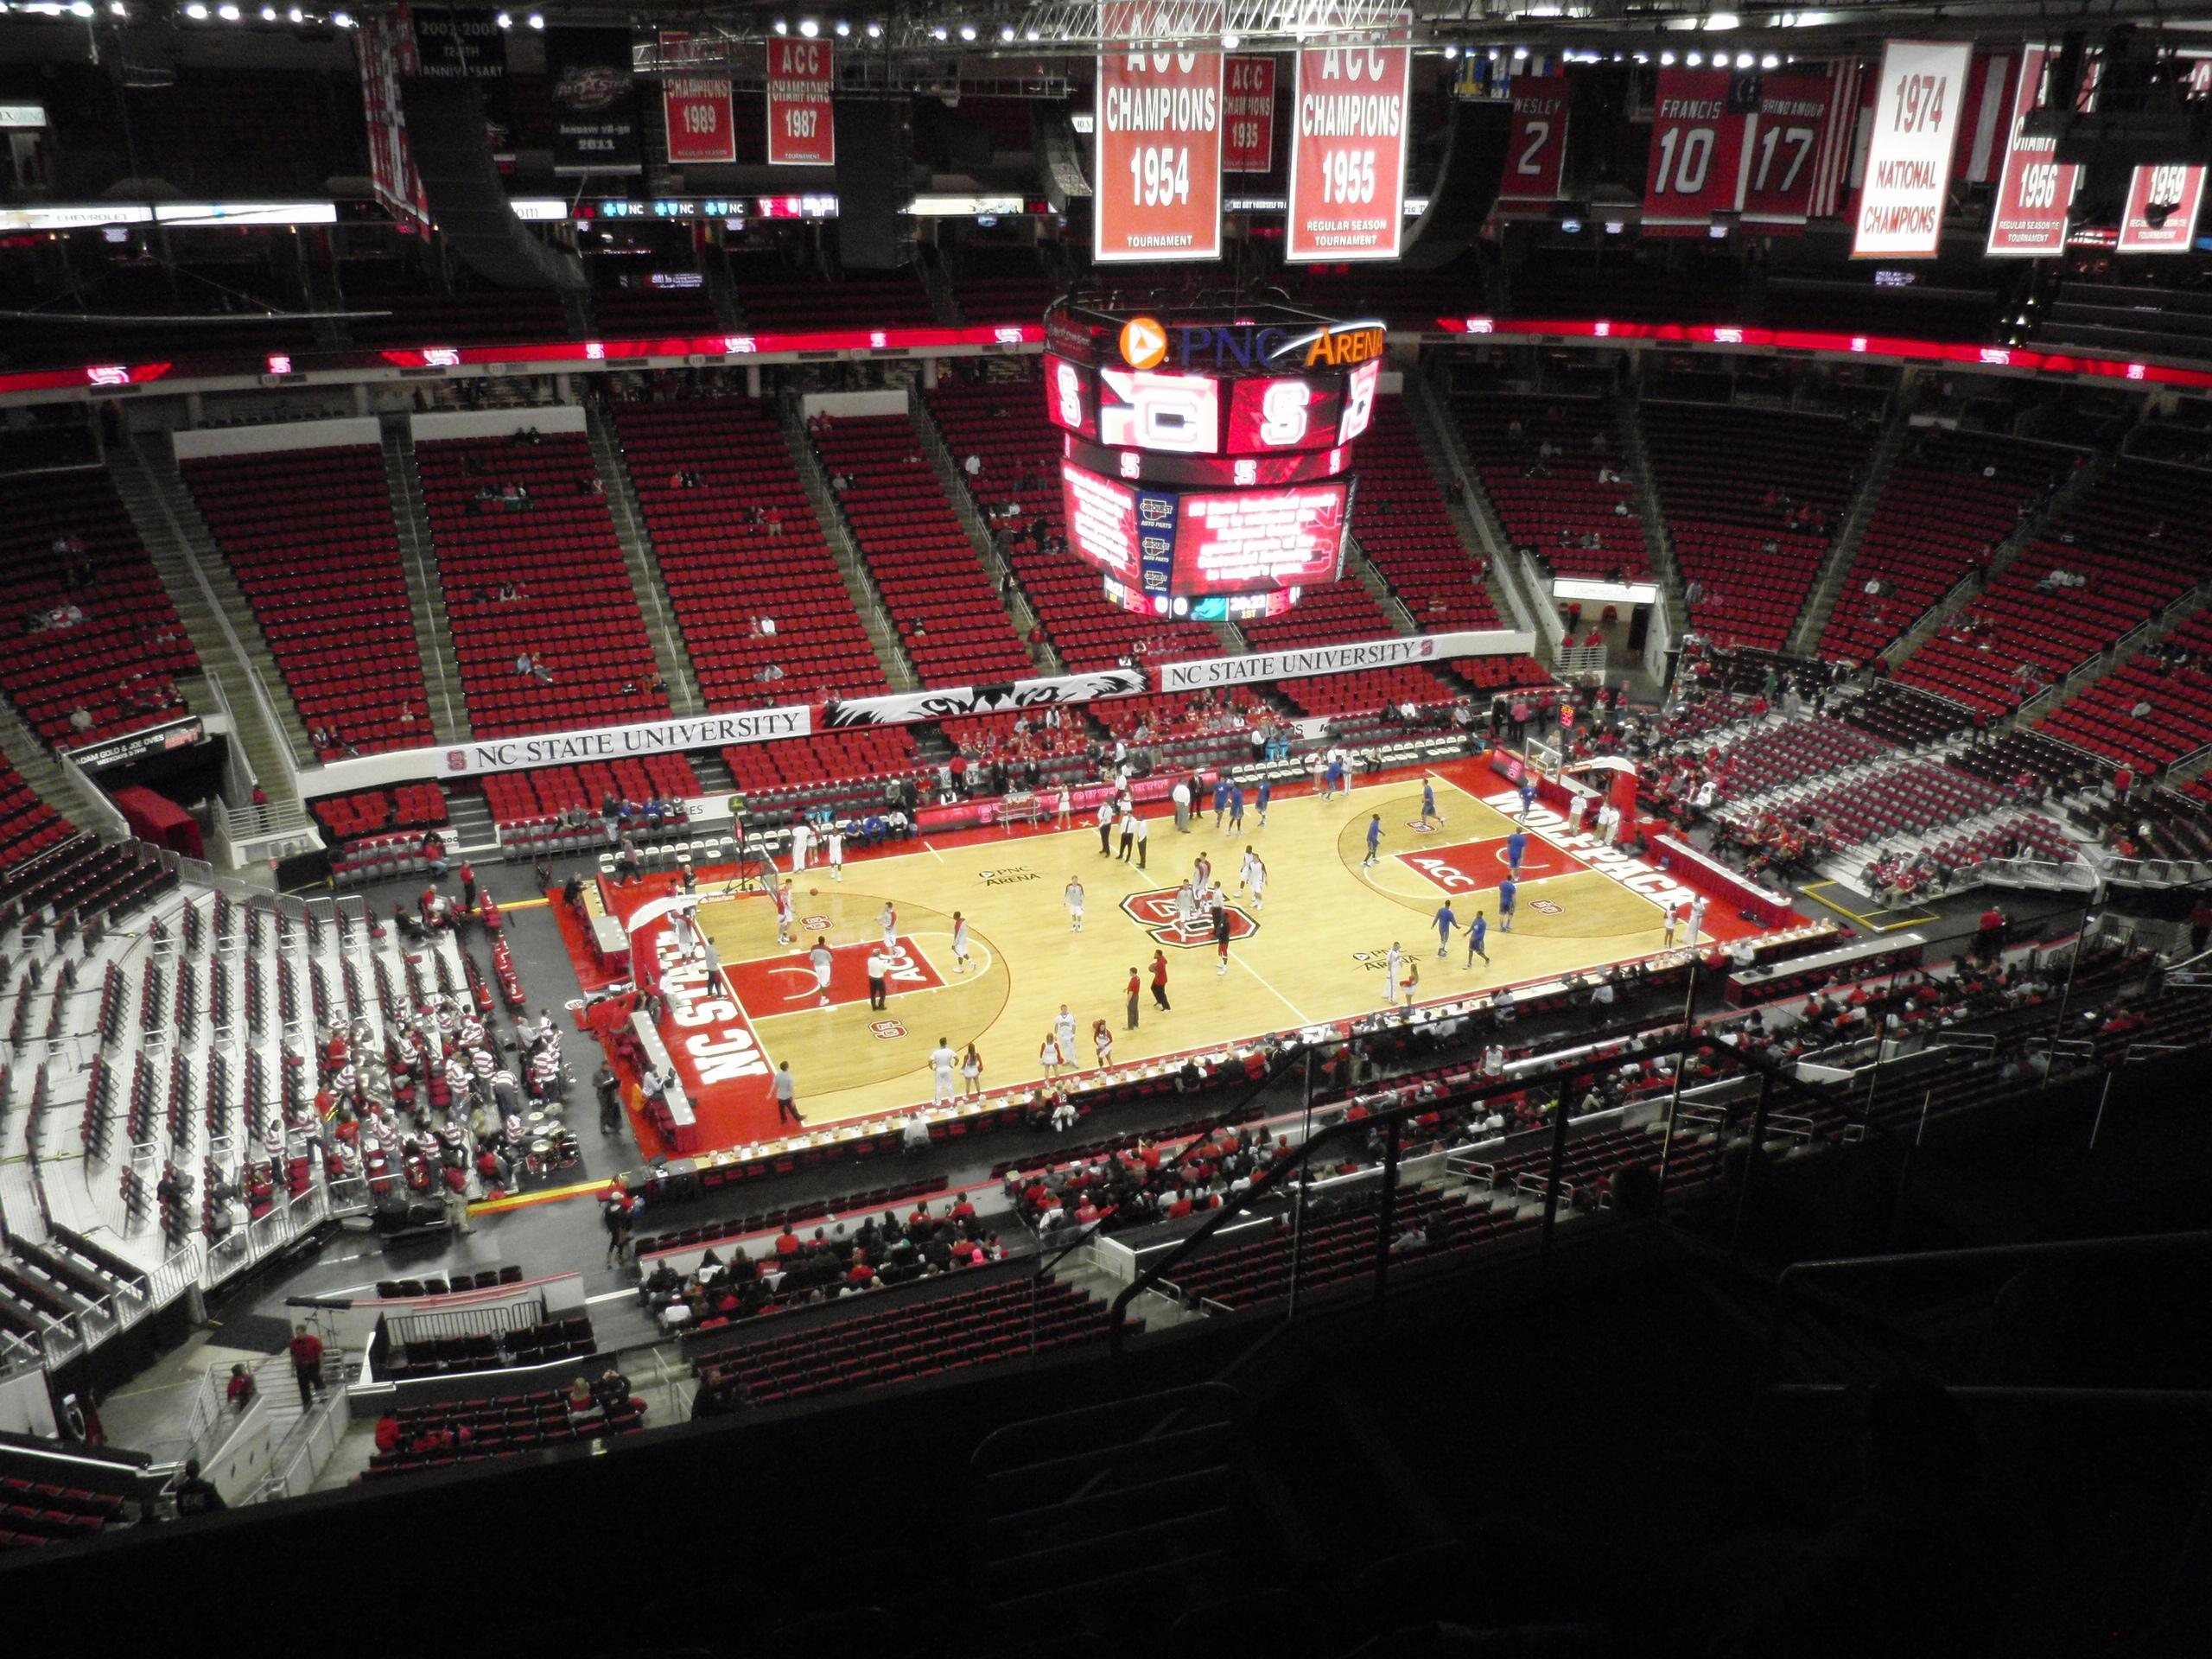 Pnc Arena Section 306 Nc State Basketball